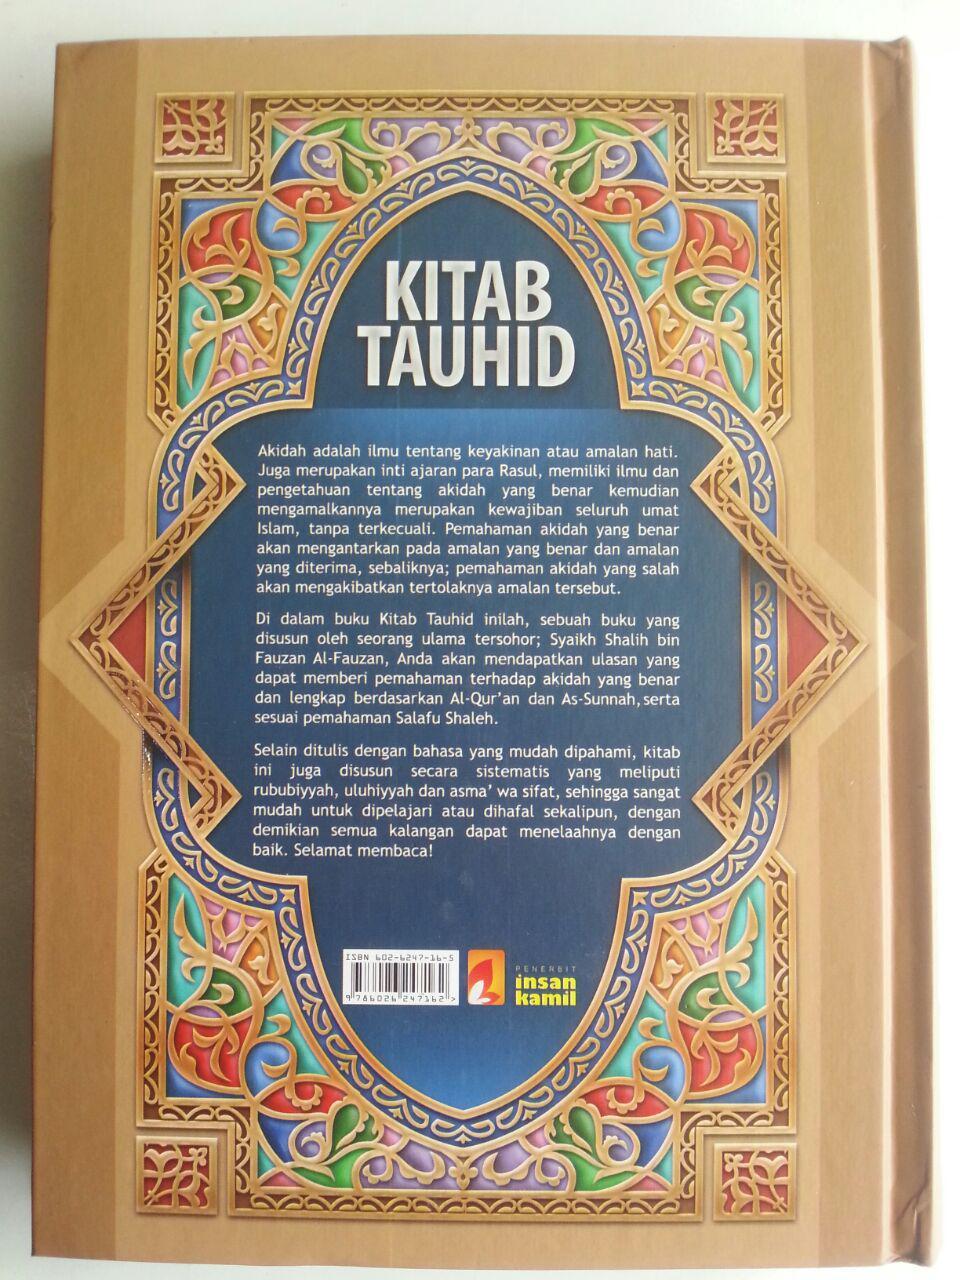 Buku Kitab Tauhid Syaikh Fauzan cover